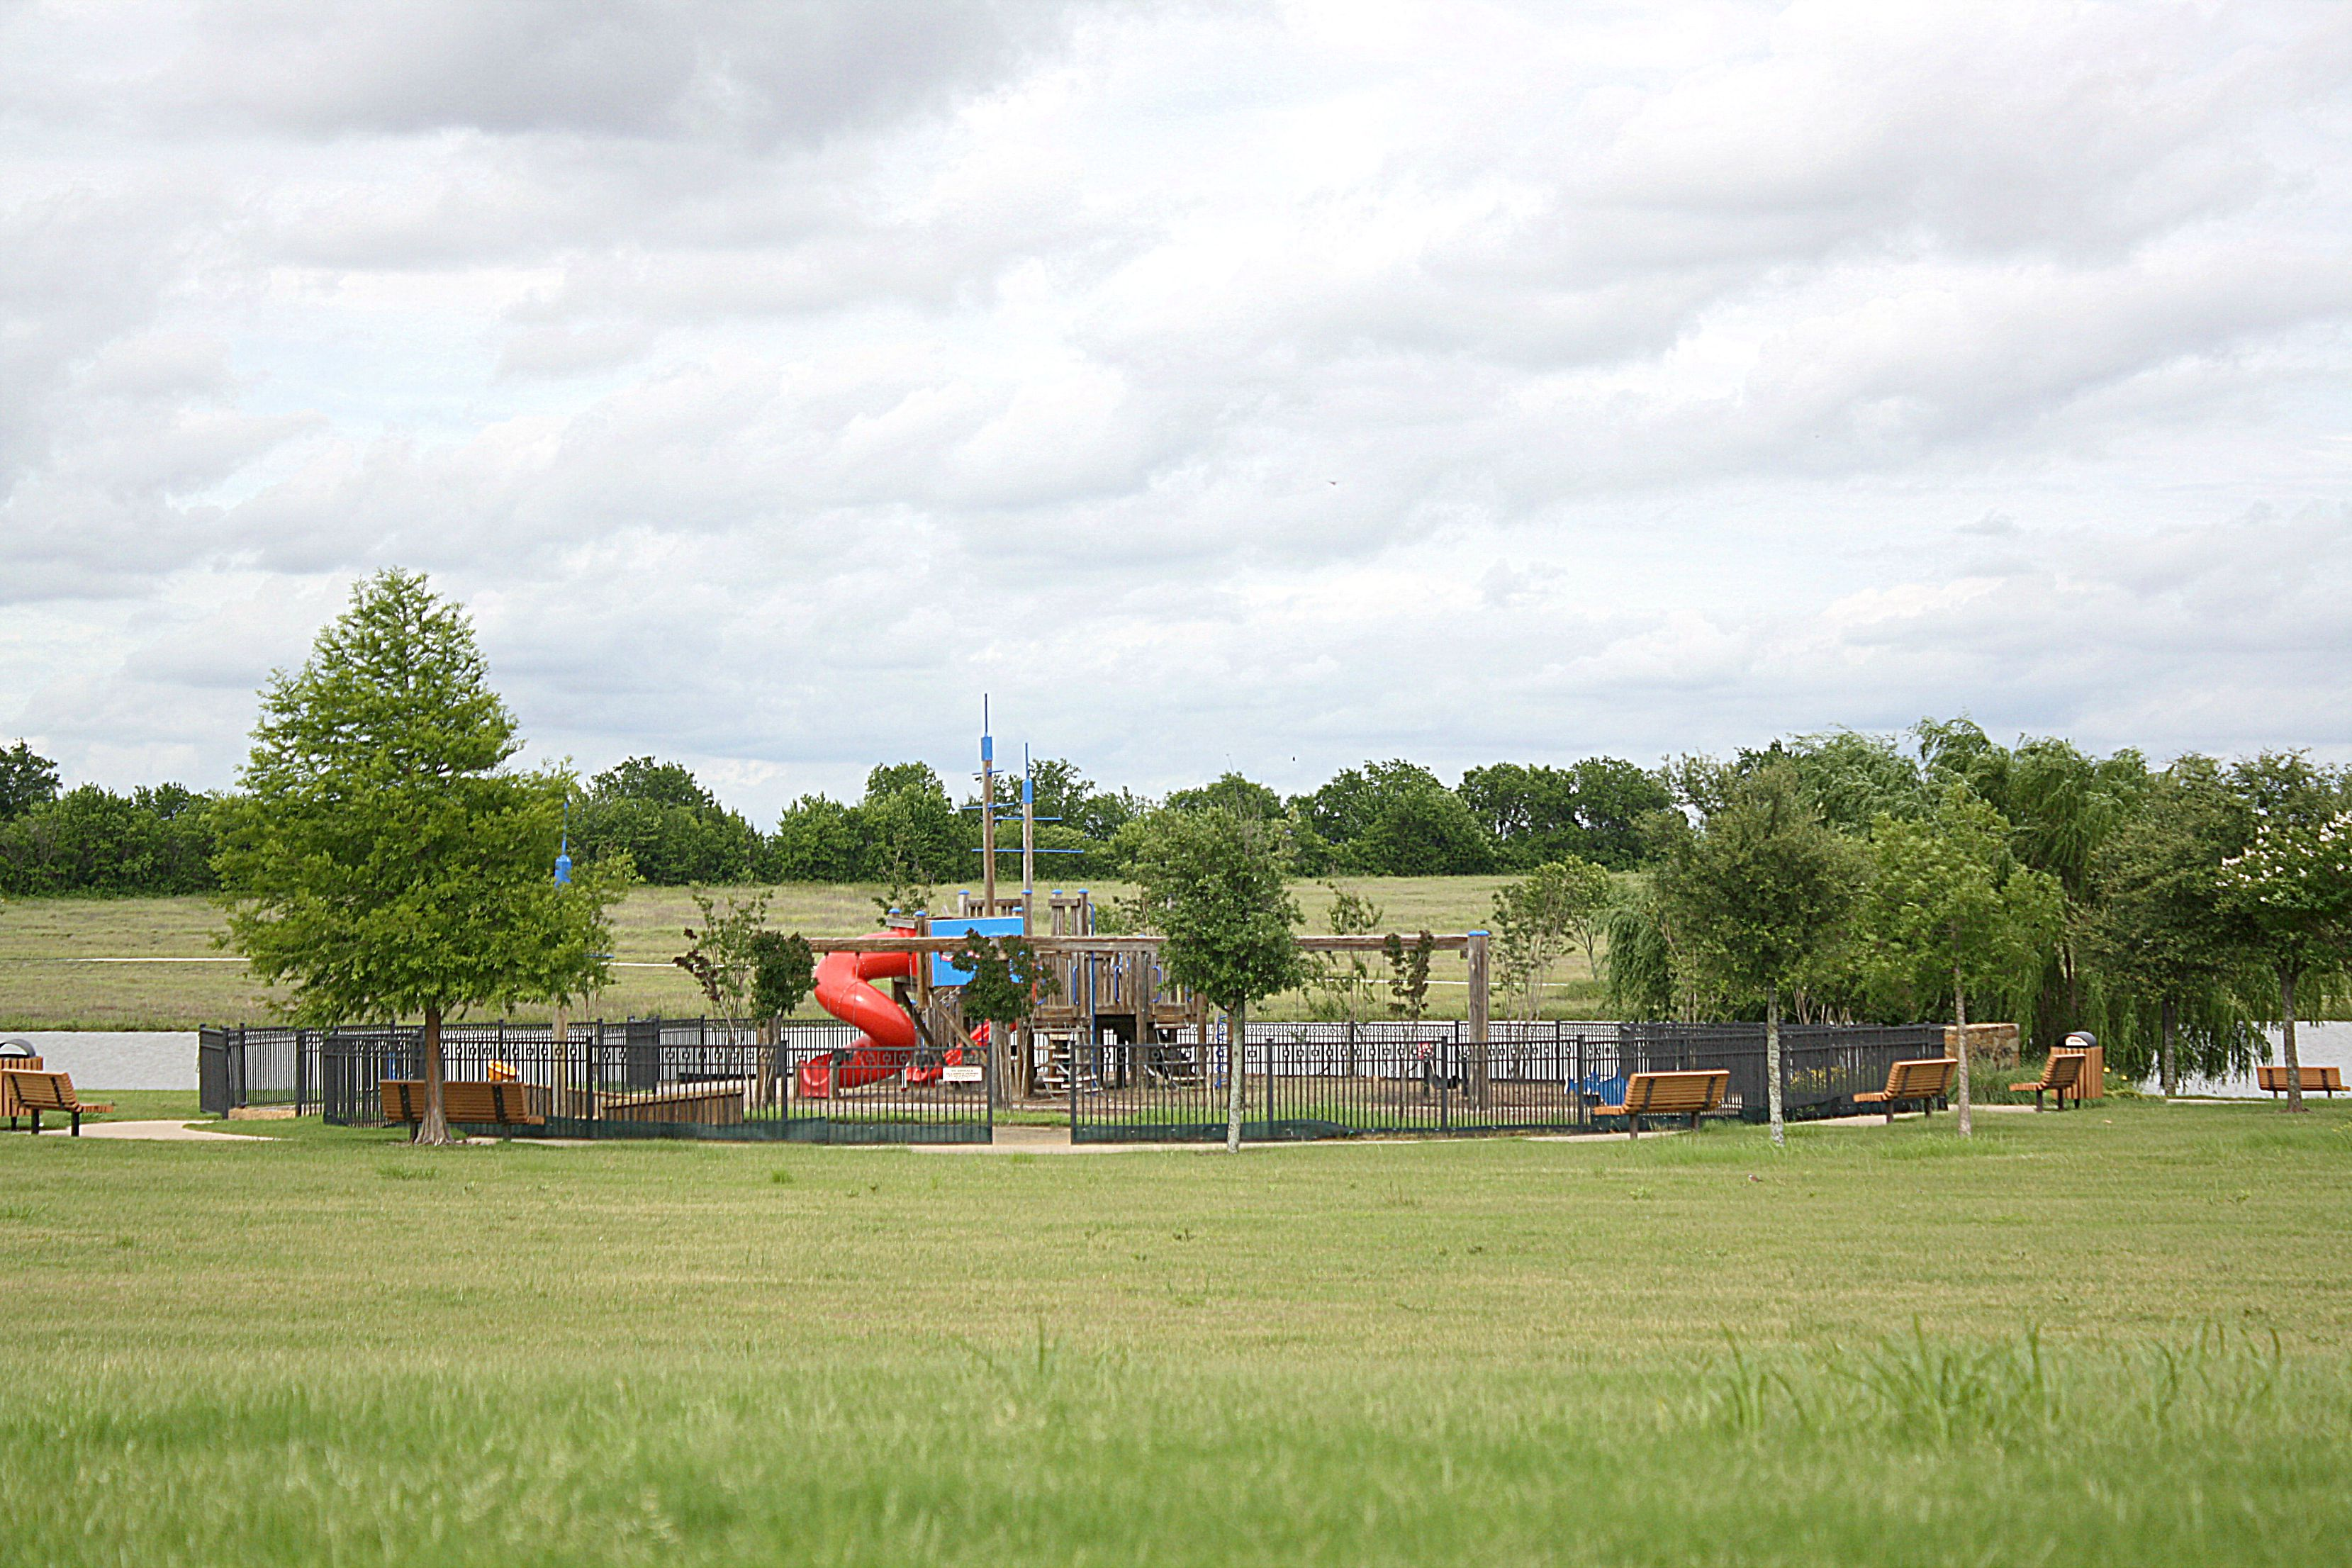 Heartland Community Park